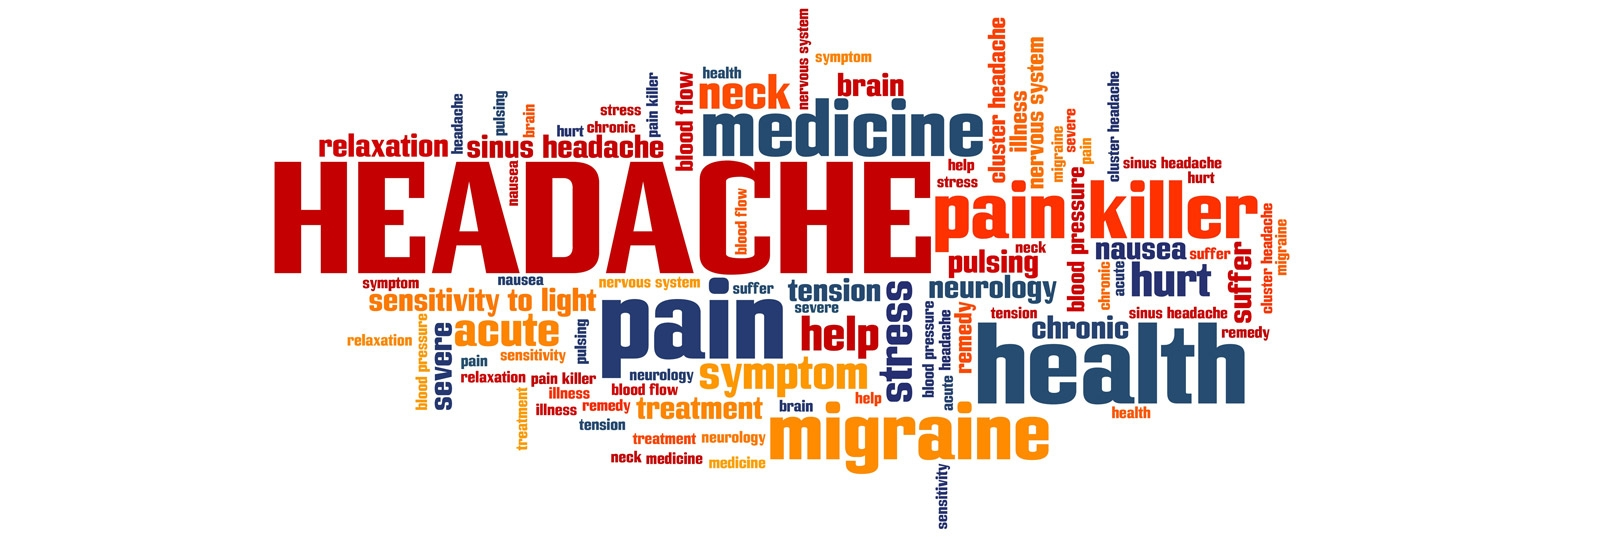 Chronic-illness